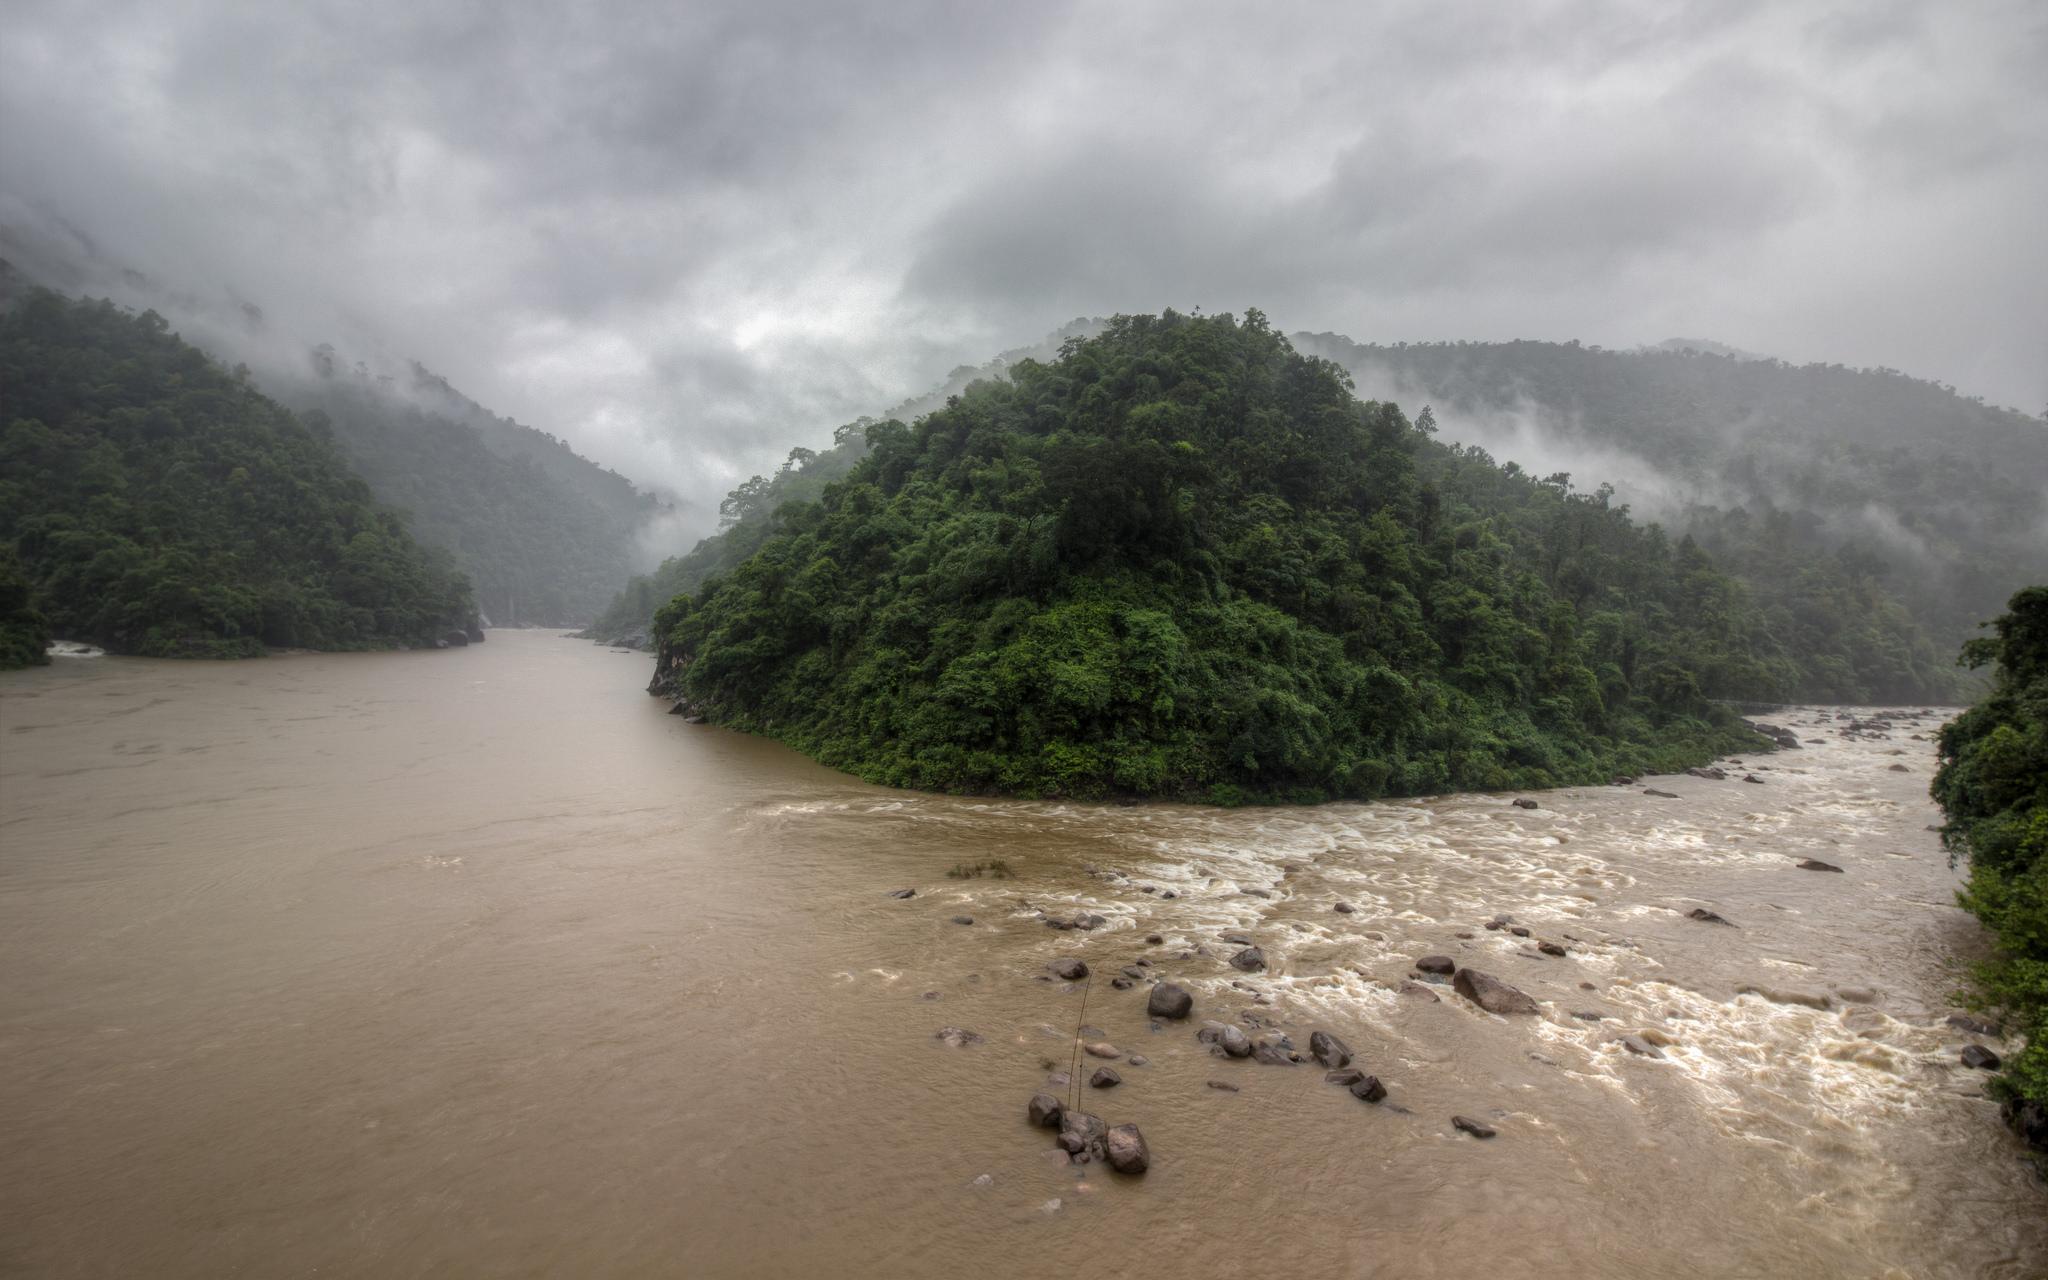 Monsoon rains nearly halt ministry in Bangladesh